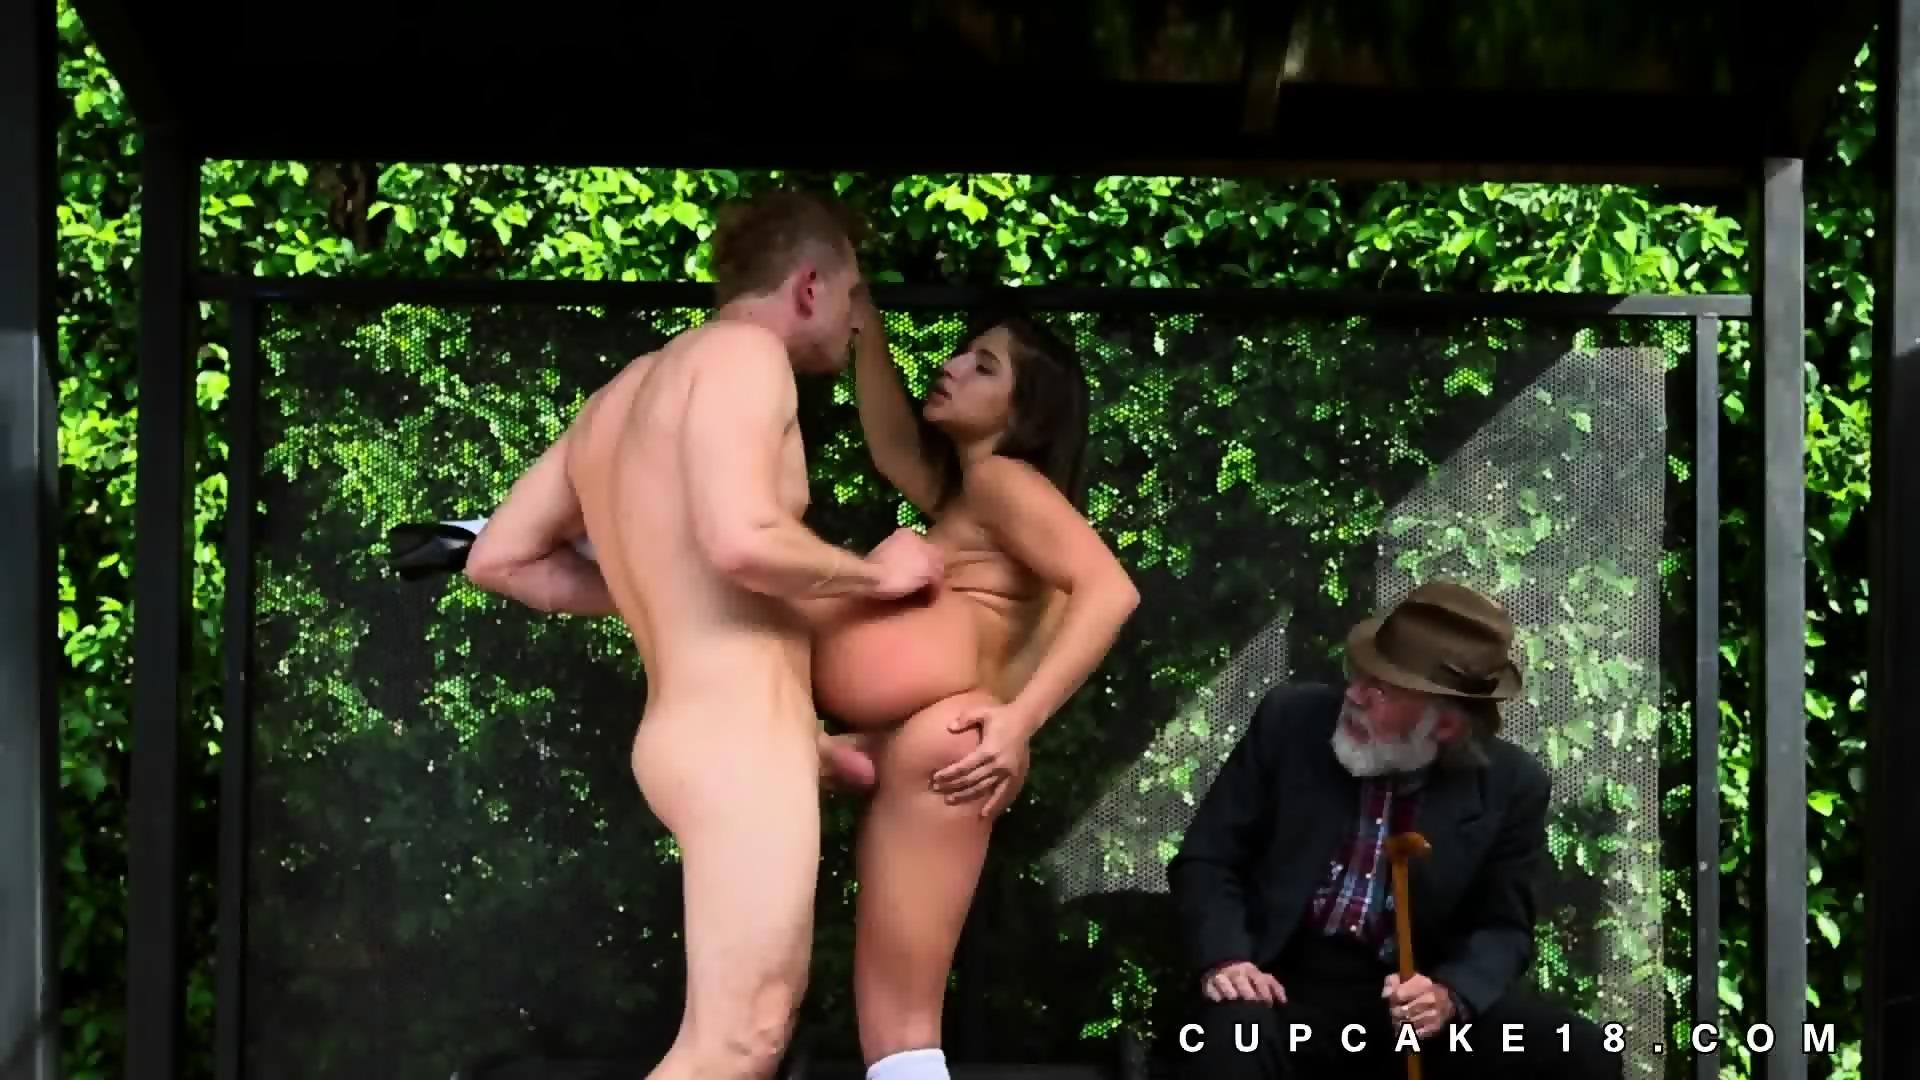 sex scene in public